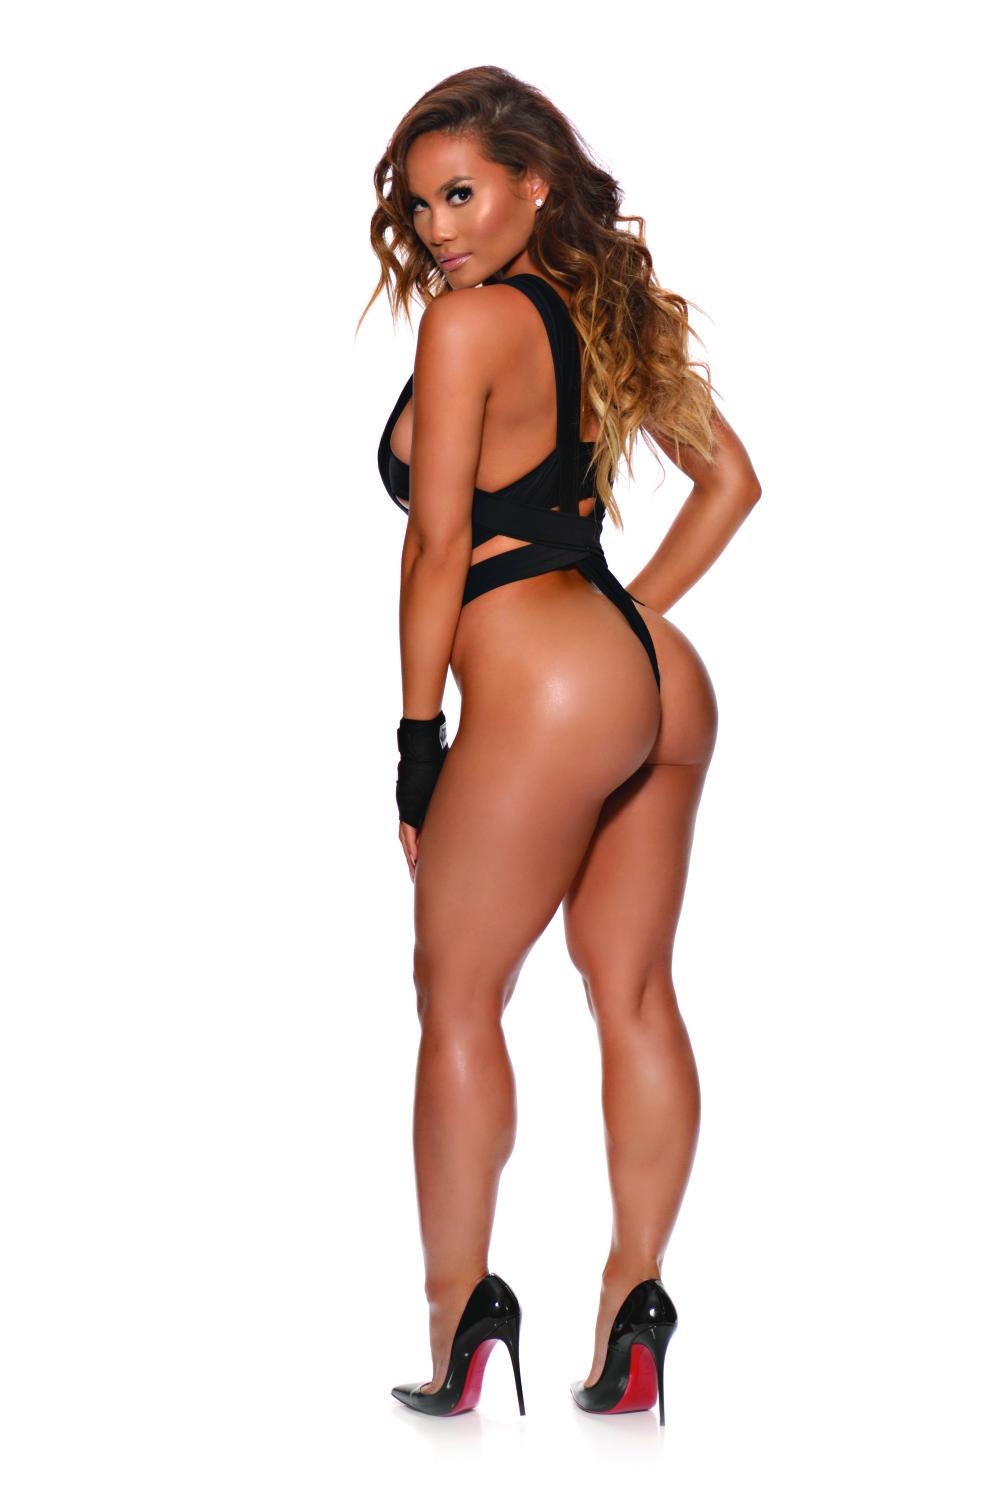 sexy topless girls in leggings